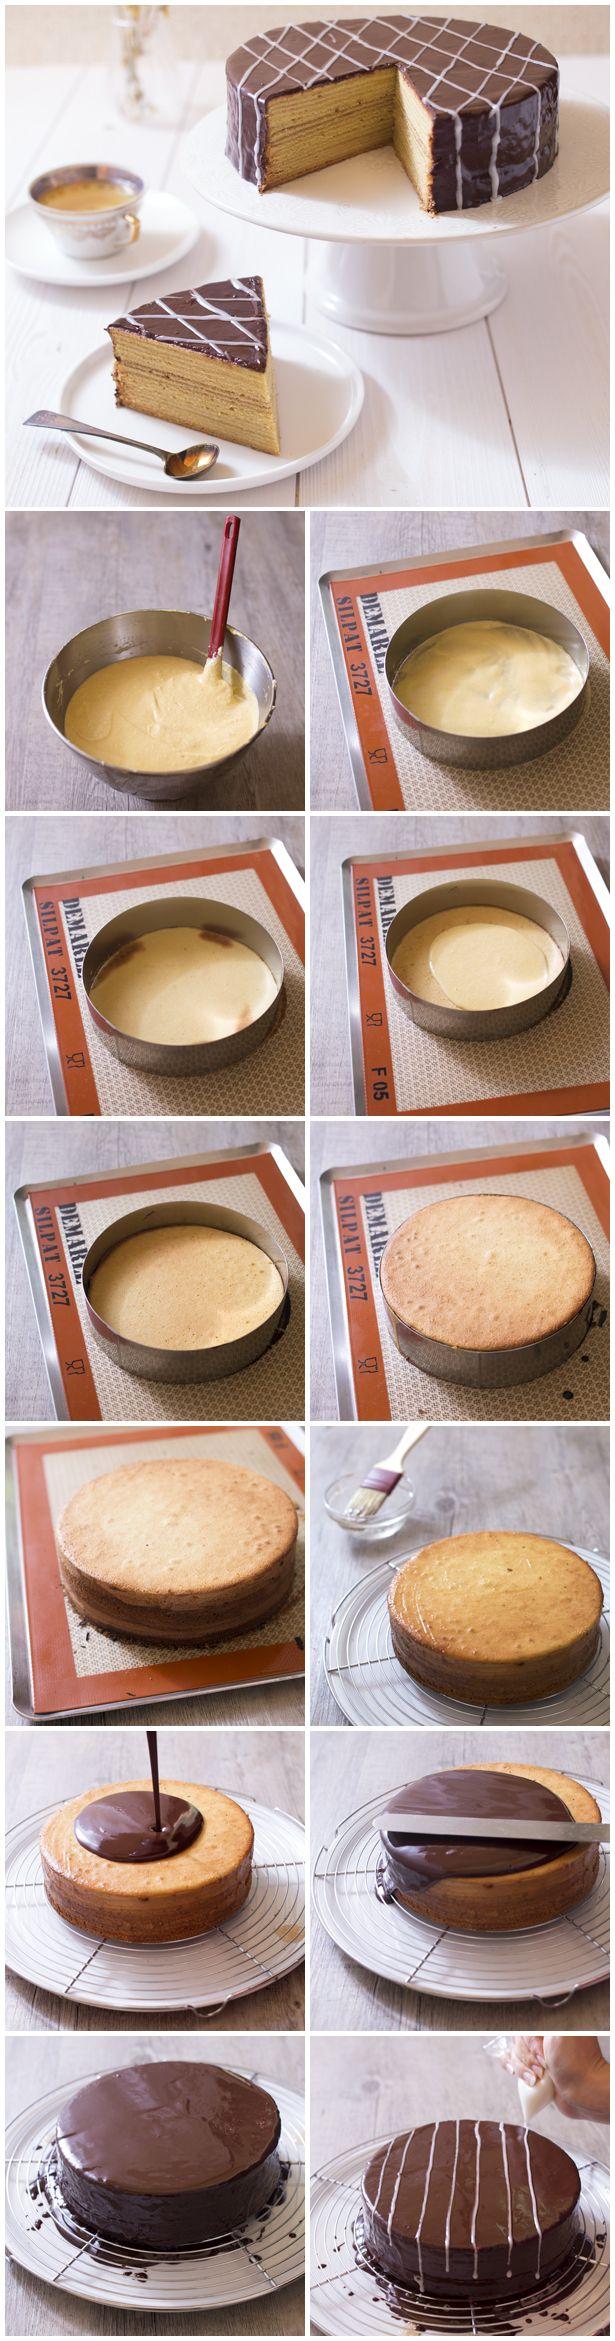 Schichttorte – gâteau à étages allemand